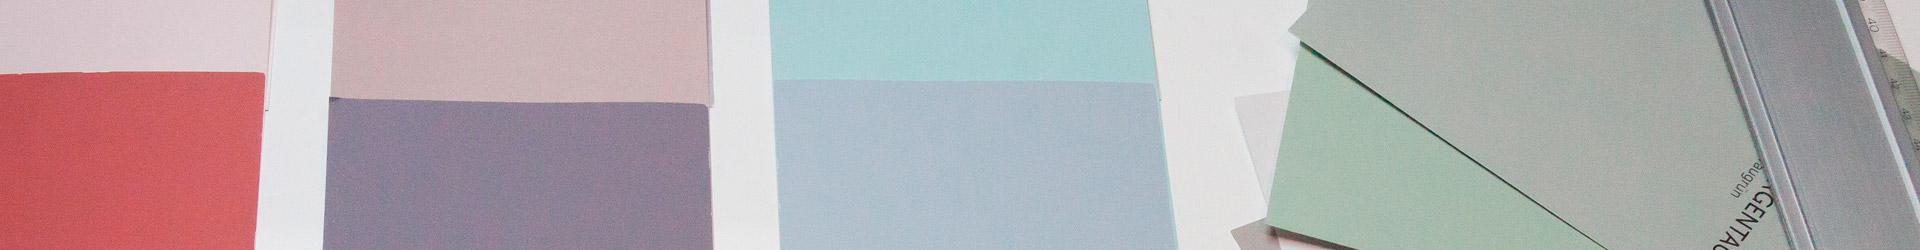 Edilmartella di Martella Yuri | Cartongesso | Tinteggiature |